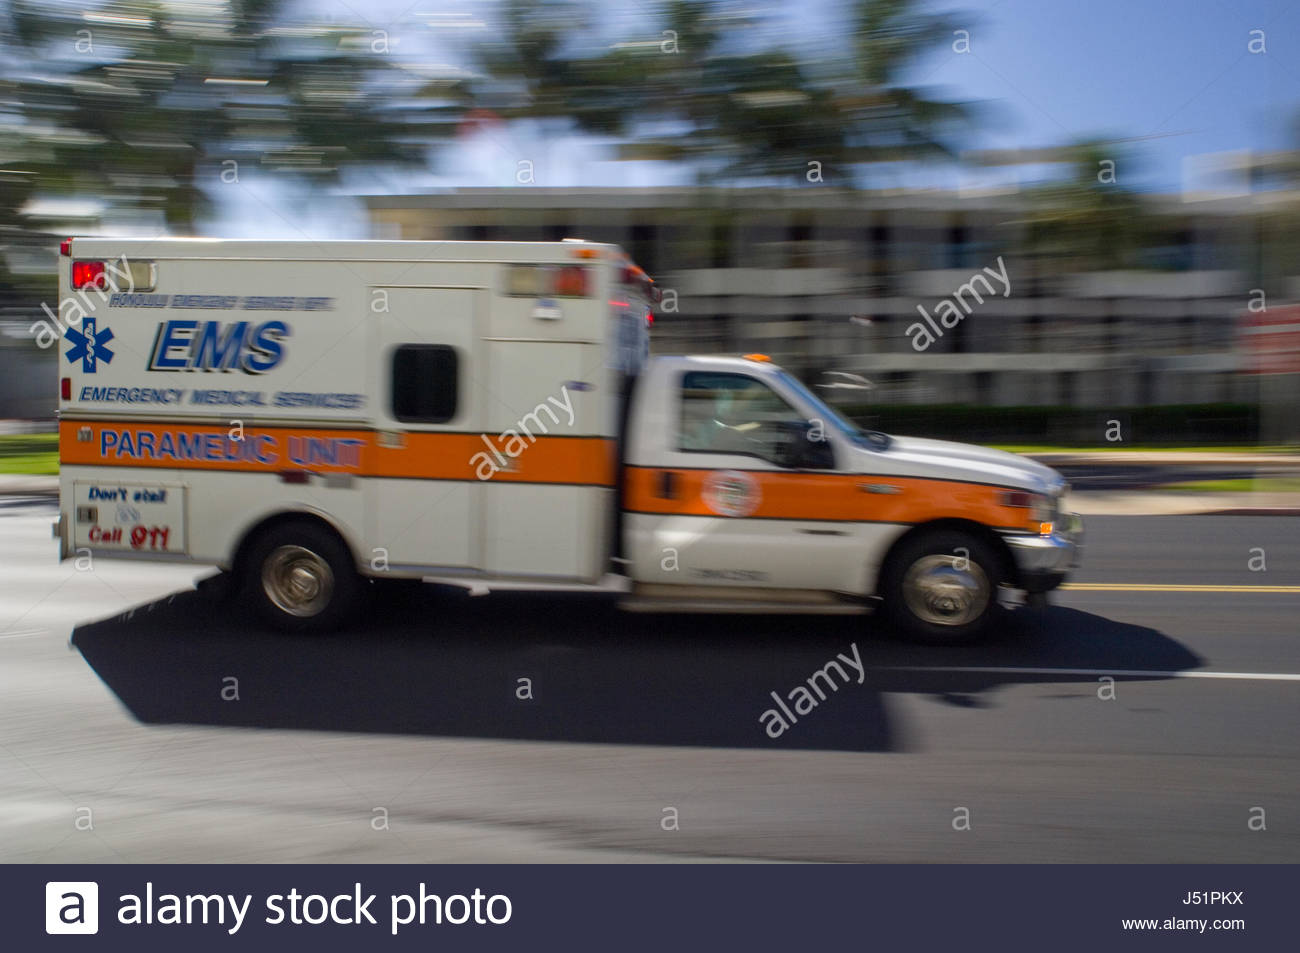 EMS ambulance racing with lights flashing and siren blaring